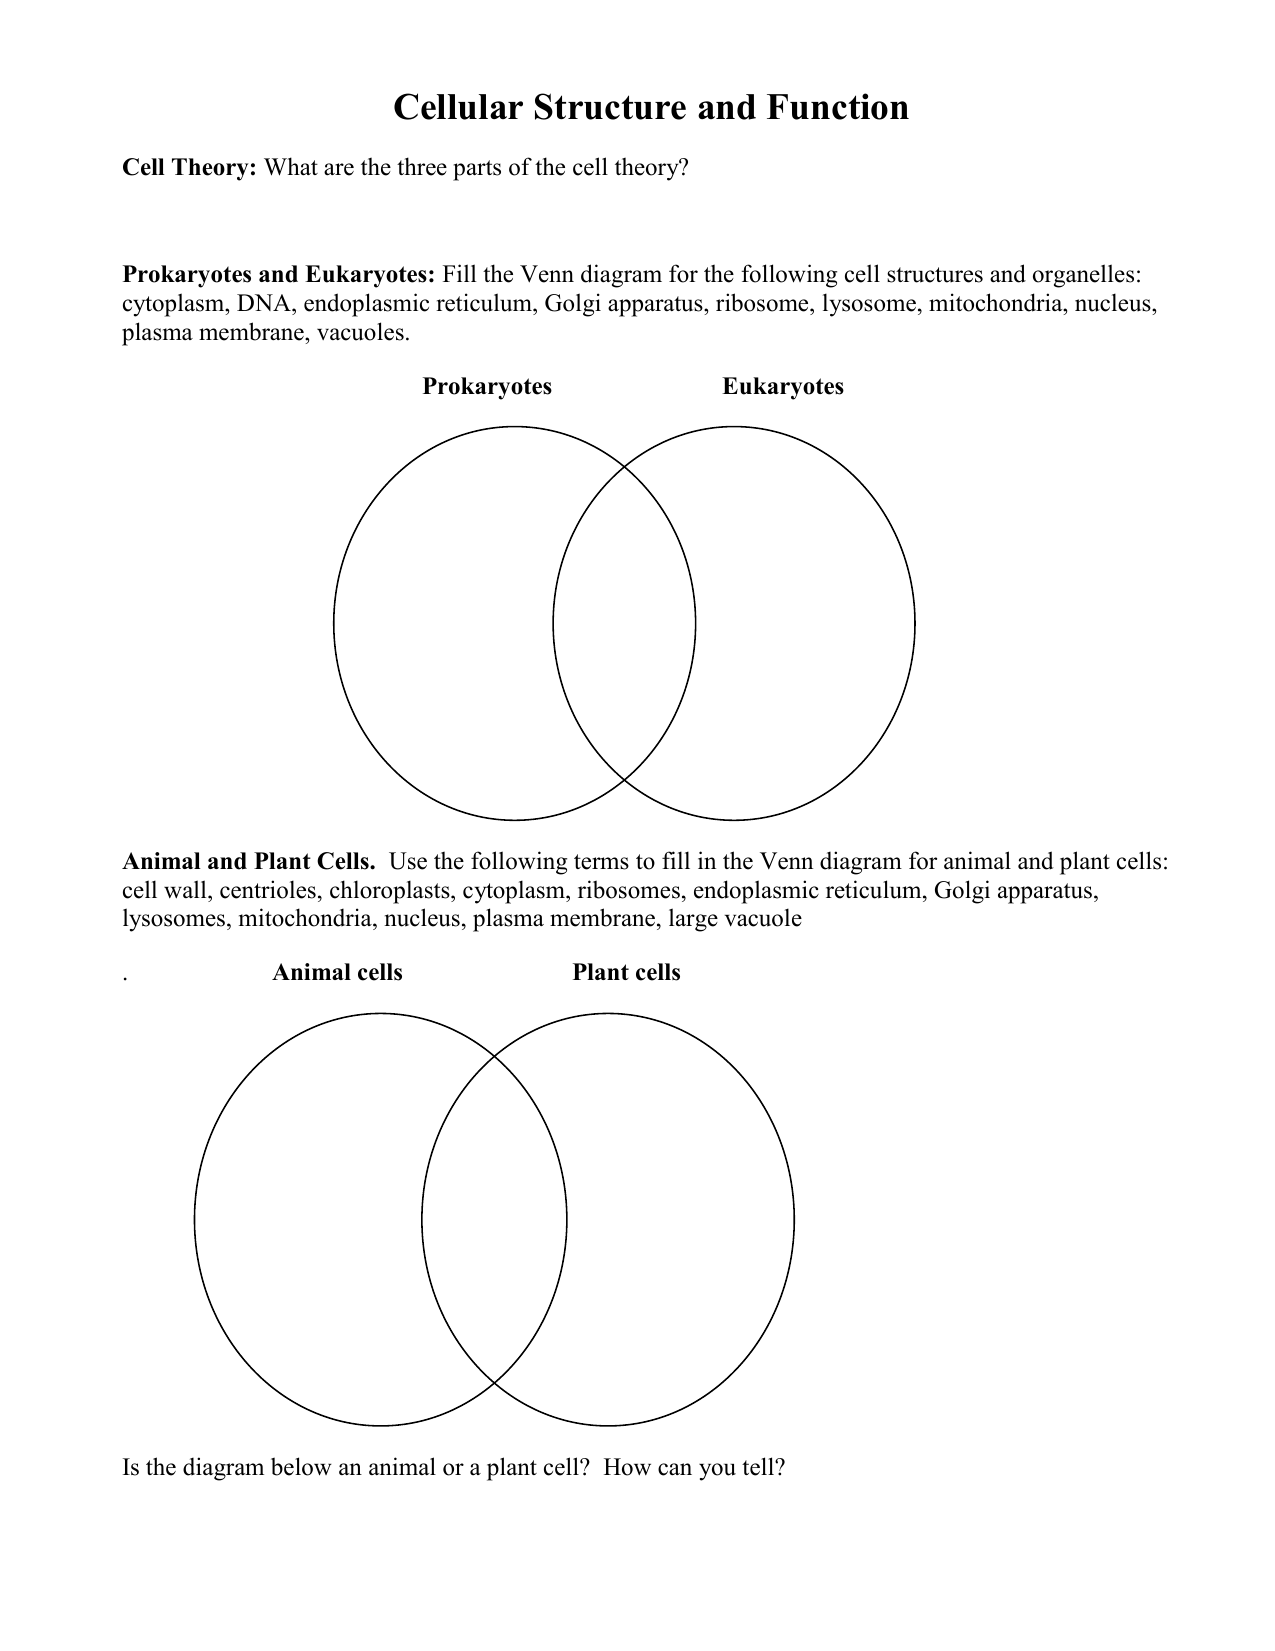 Prokaryotic And Eukaryotic Cells Venn Diagram Worksheet